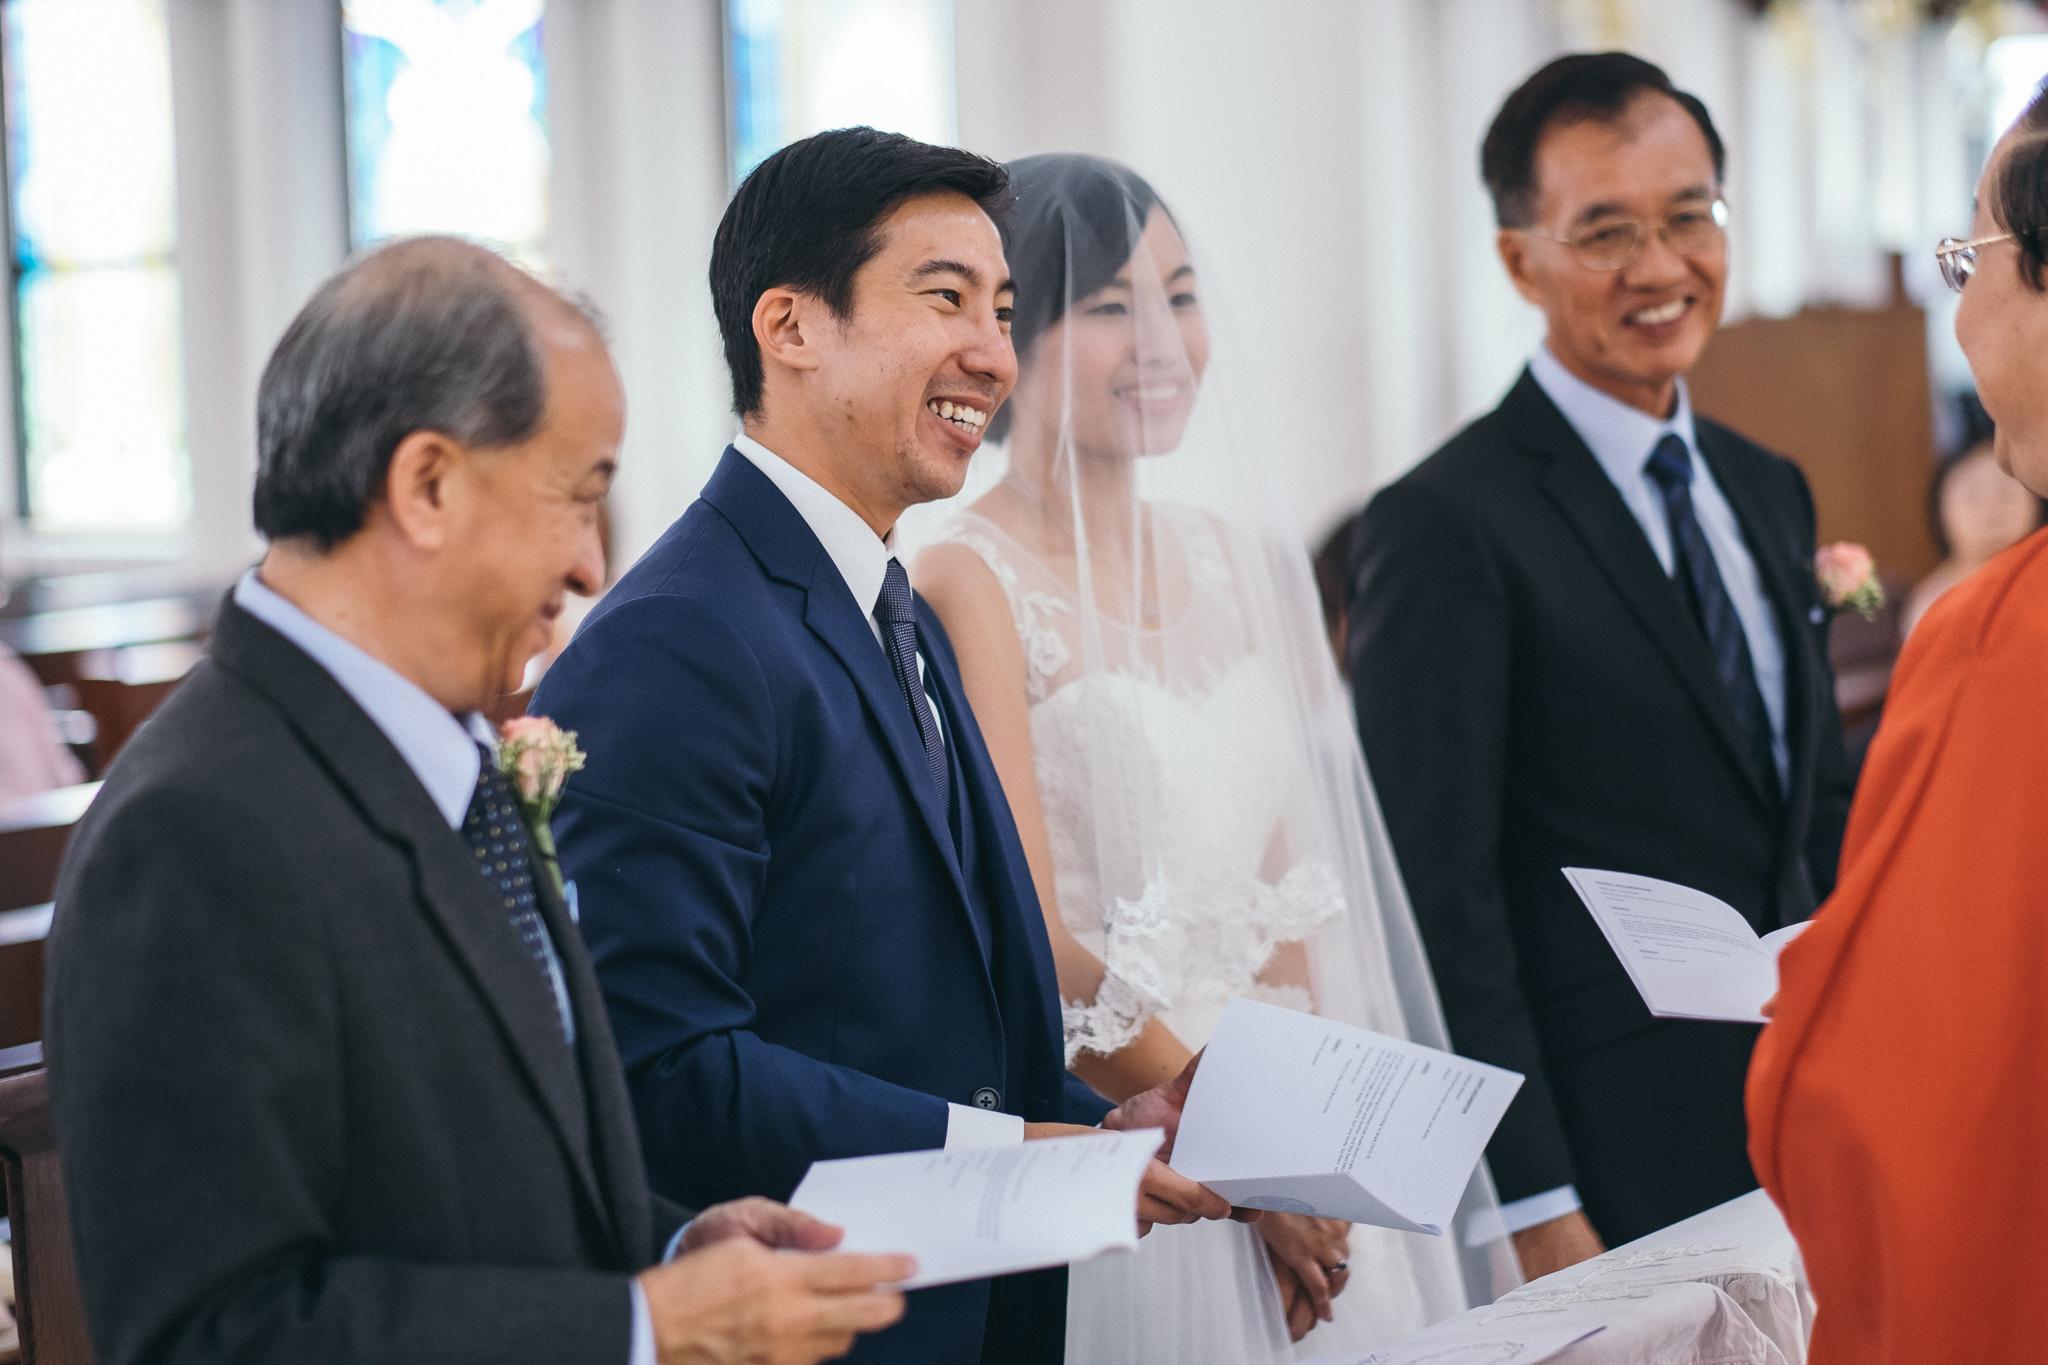 Juxtapose Pix - Wedding - Kelvin & Serene - church regent hotel 00029.jpg